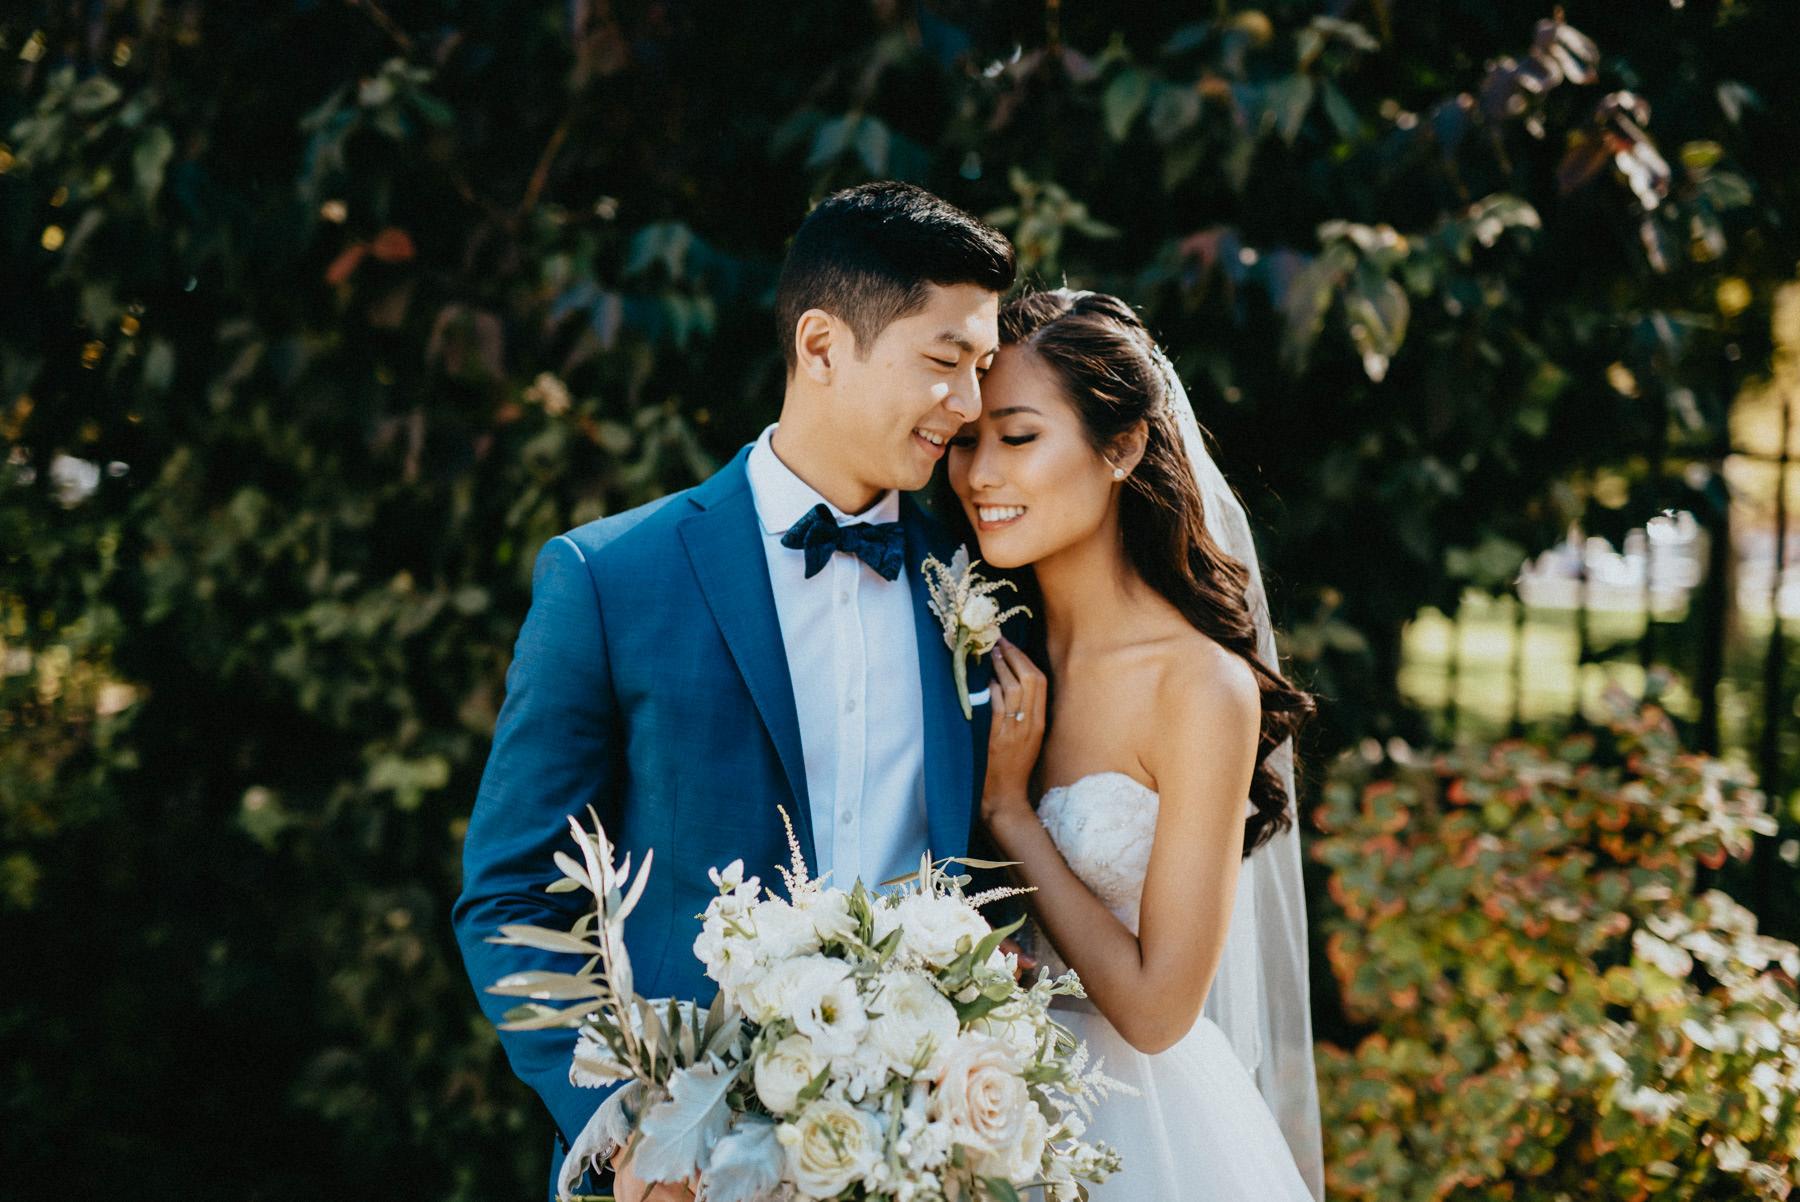 176-stylish-philadelphia-wedding-10.jpg